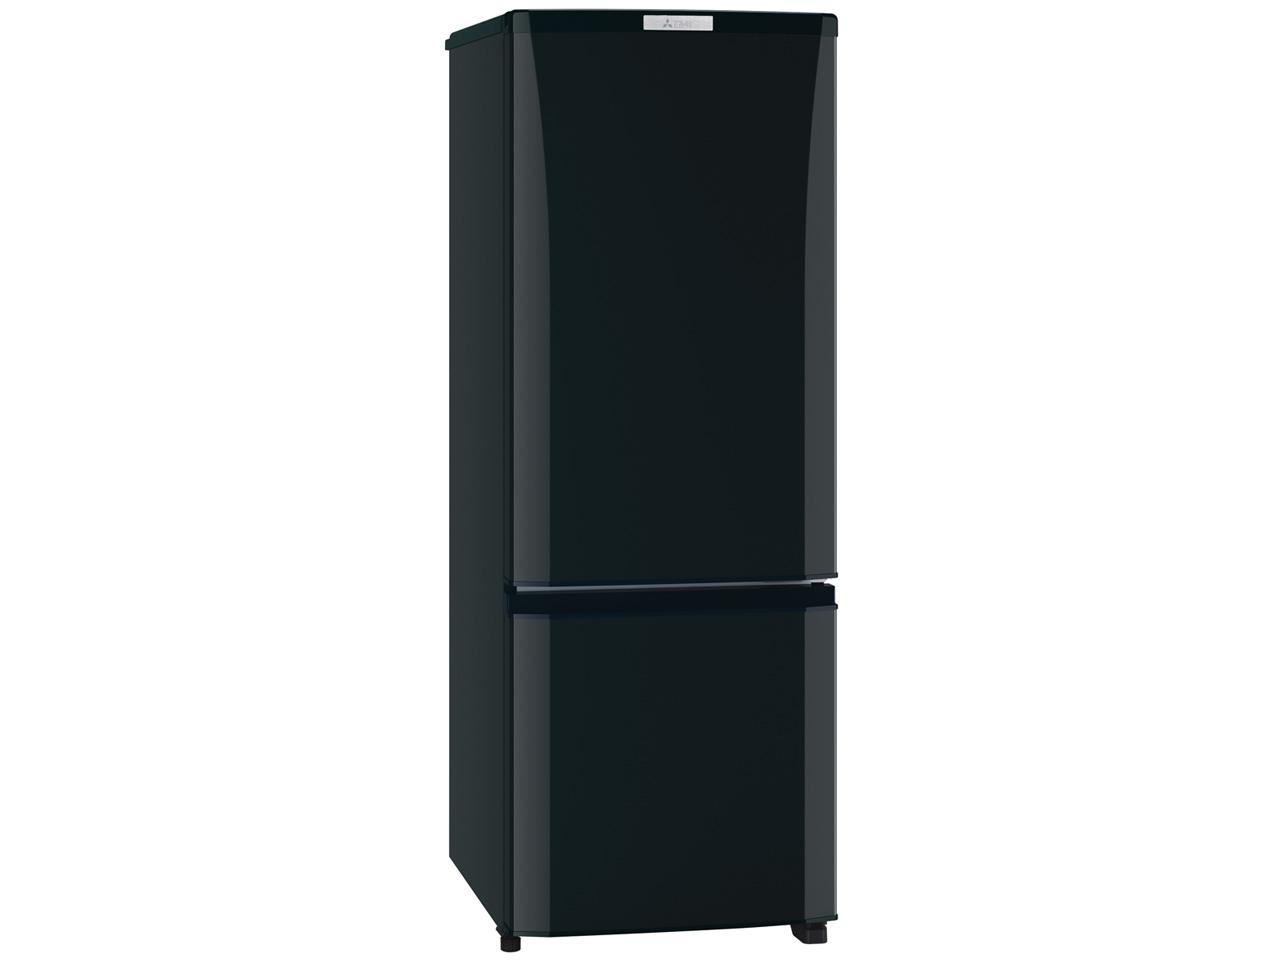 三菱 168L 2ドア冷蔵庫 MR-P17C-B 質量:41kg